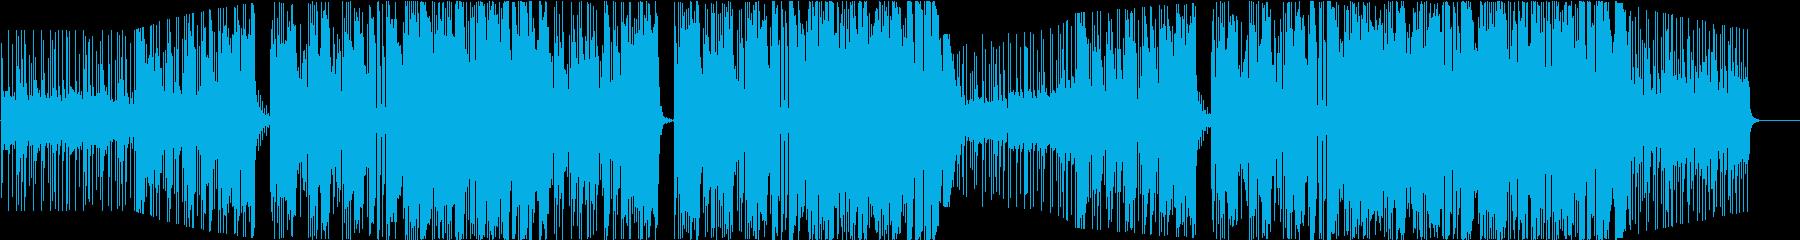 EDM系マシュメロ風スタイリッシュな曲6の再生済みの波形